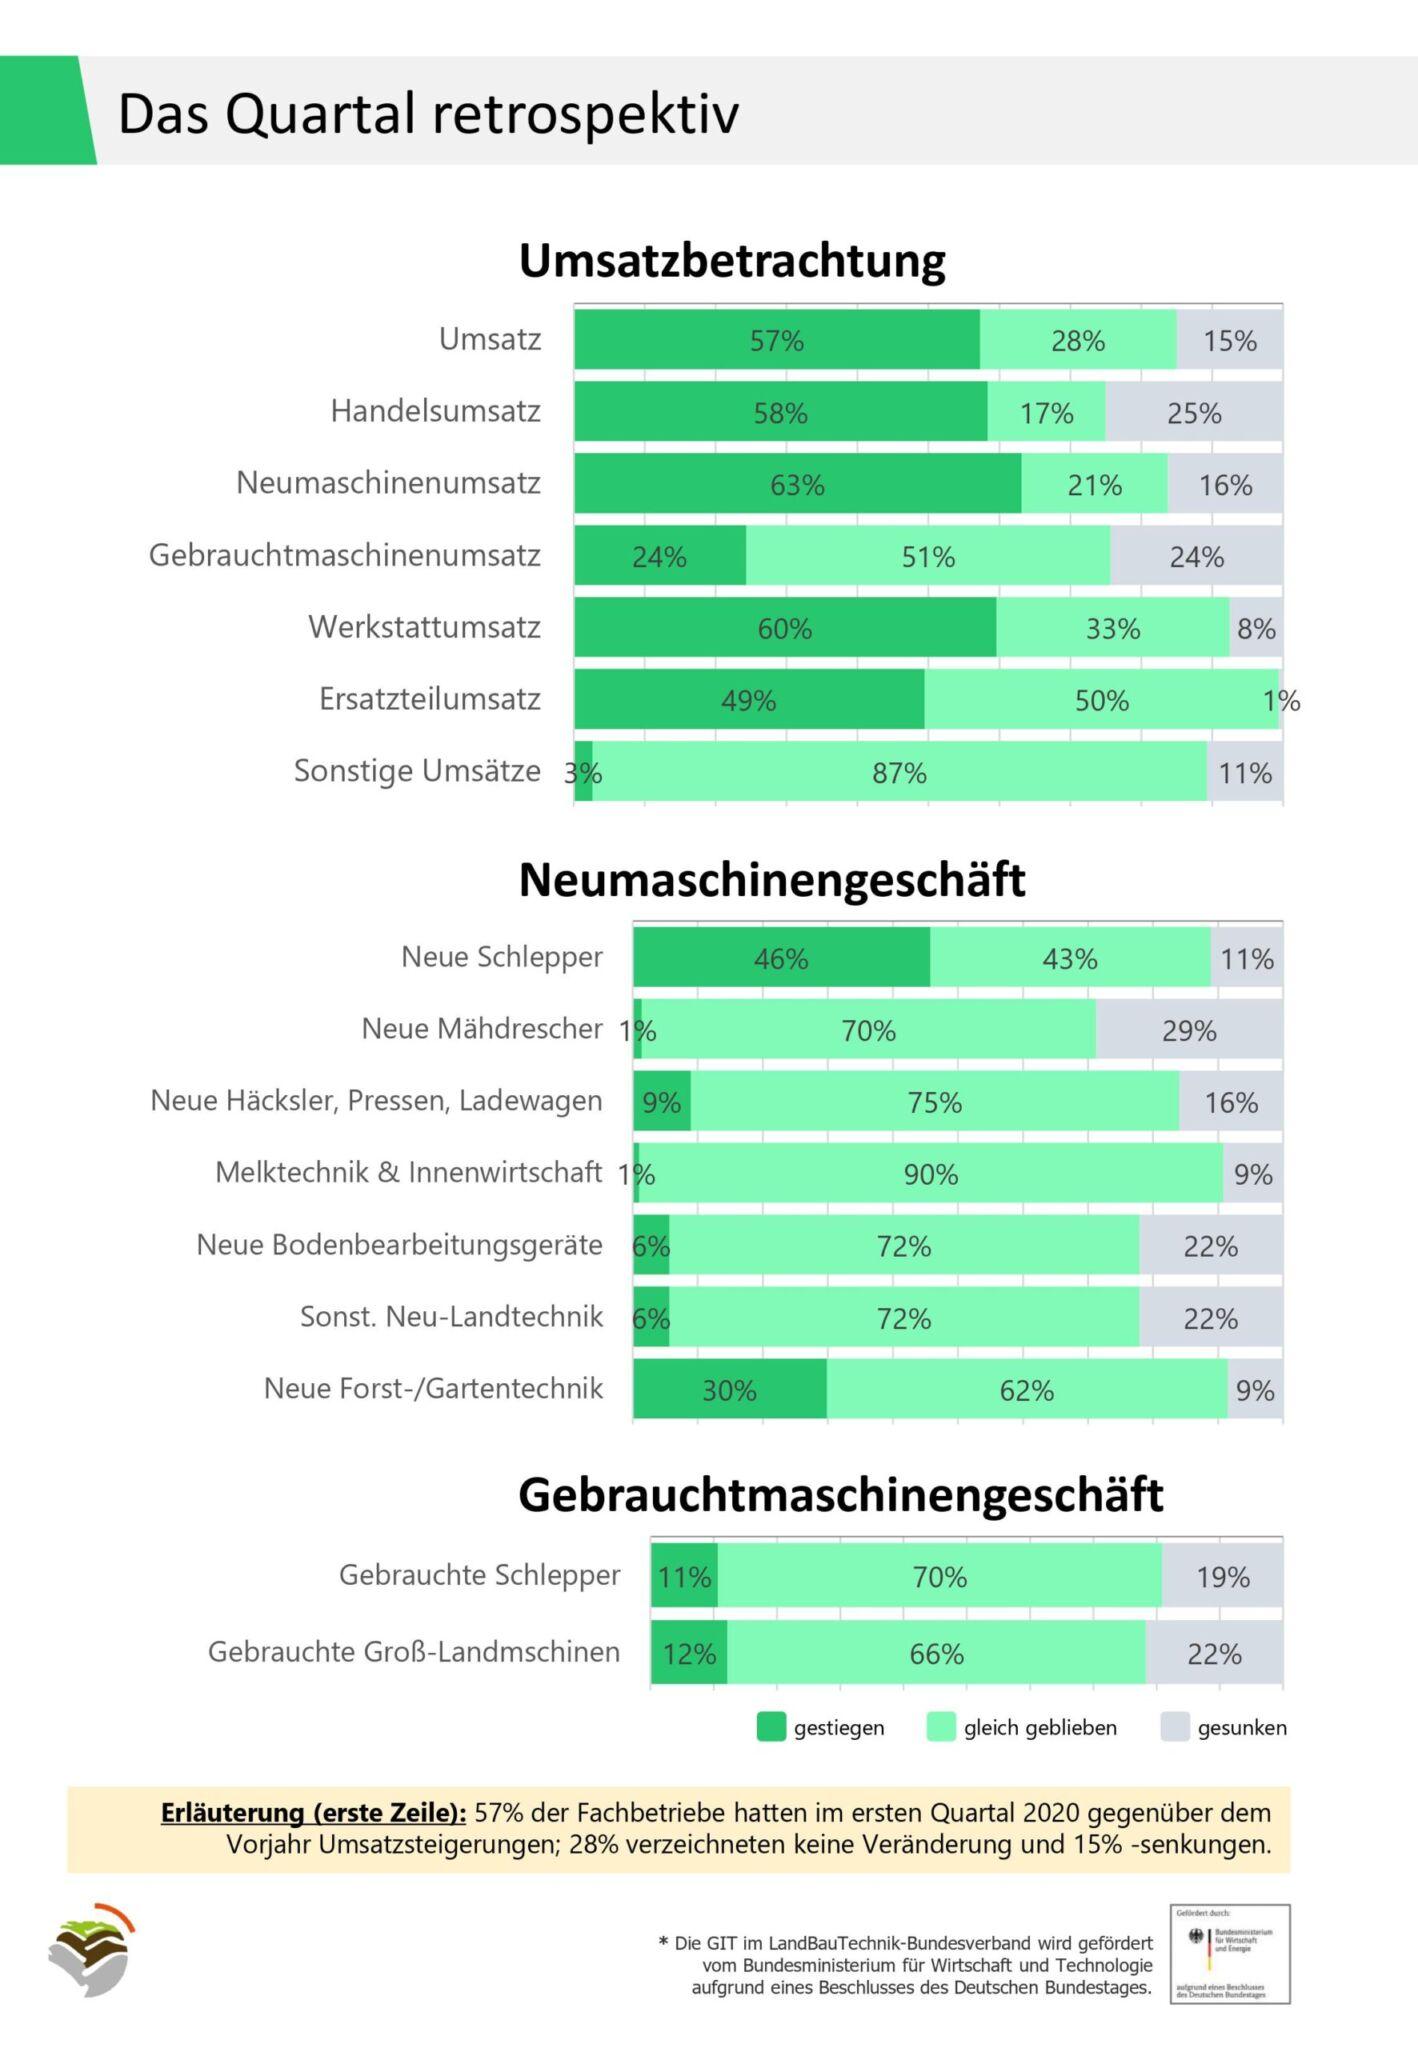 Branchenkonjunktur LandBauTechnik im Frühjahr 2020|copyright: Bundesverband LandBauTechnik e.V.